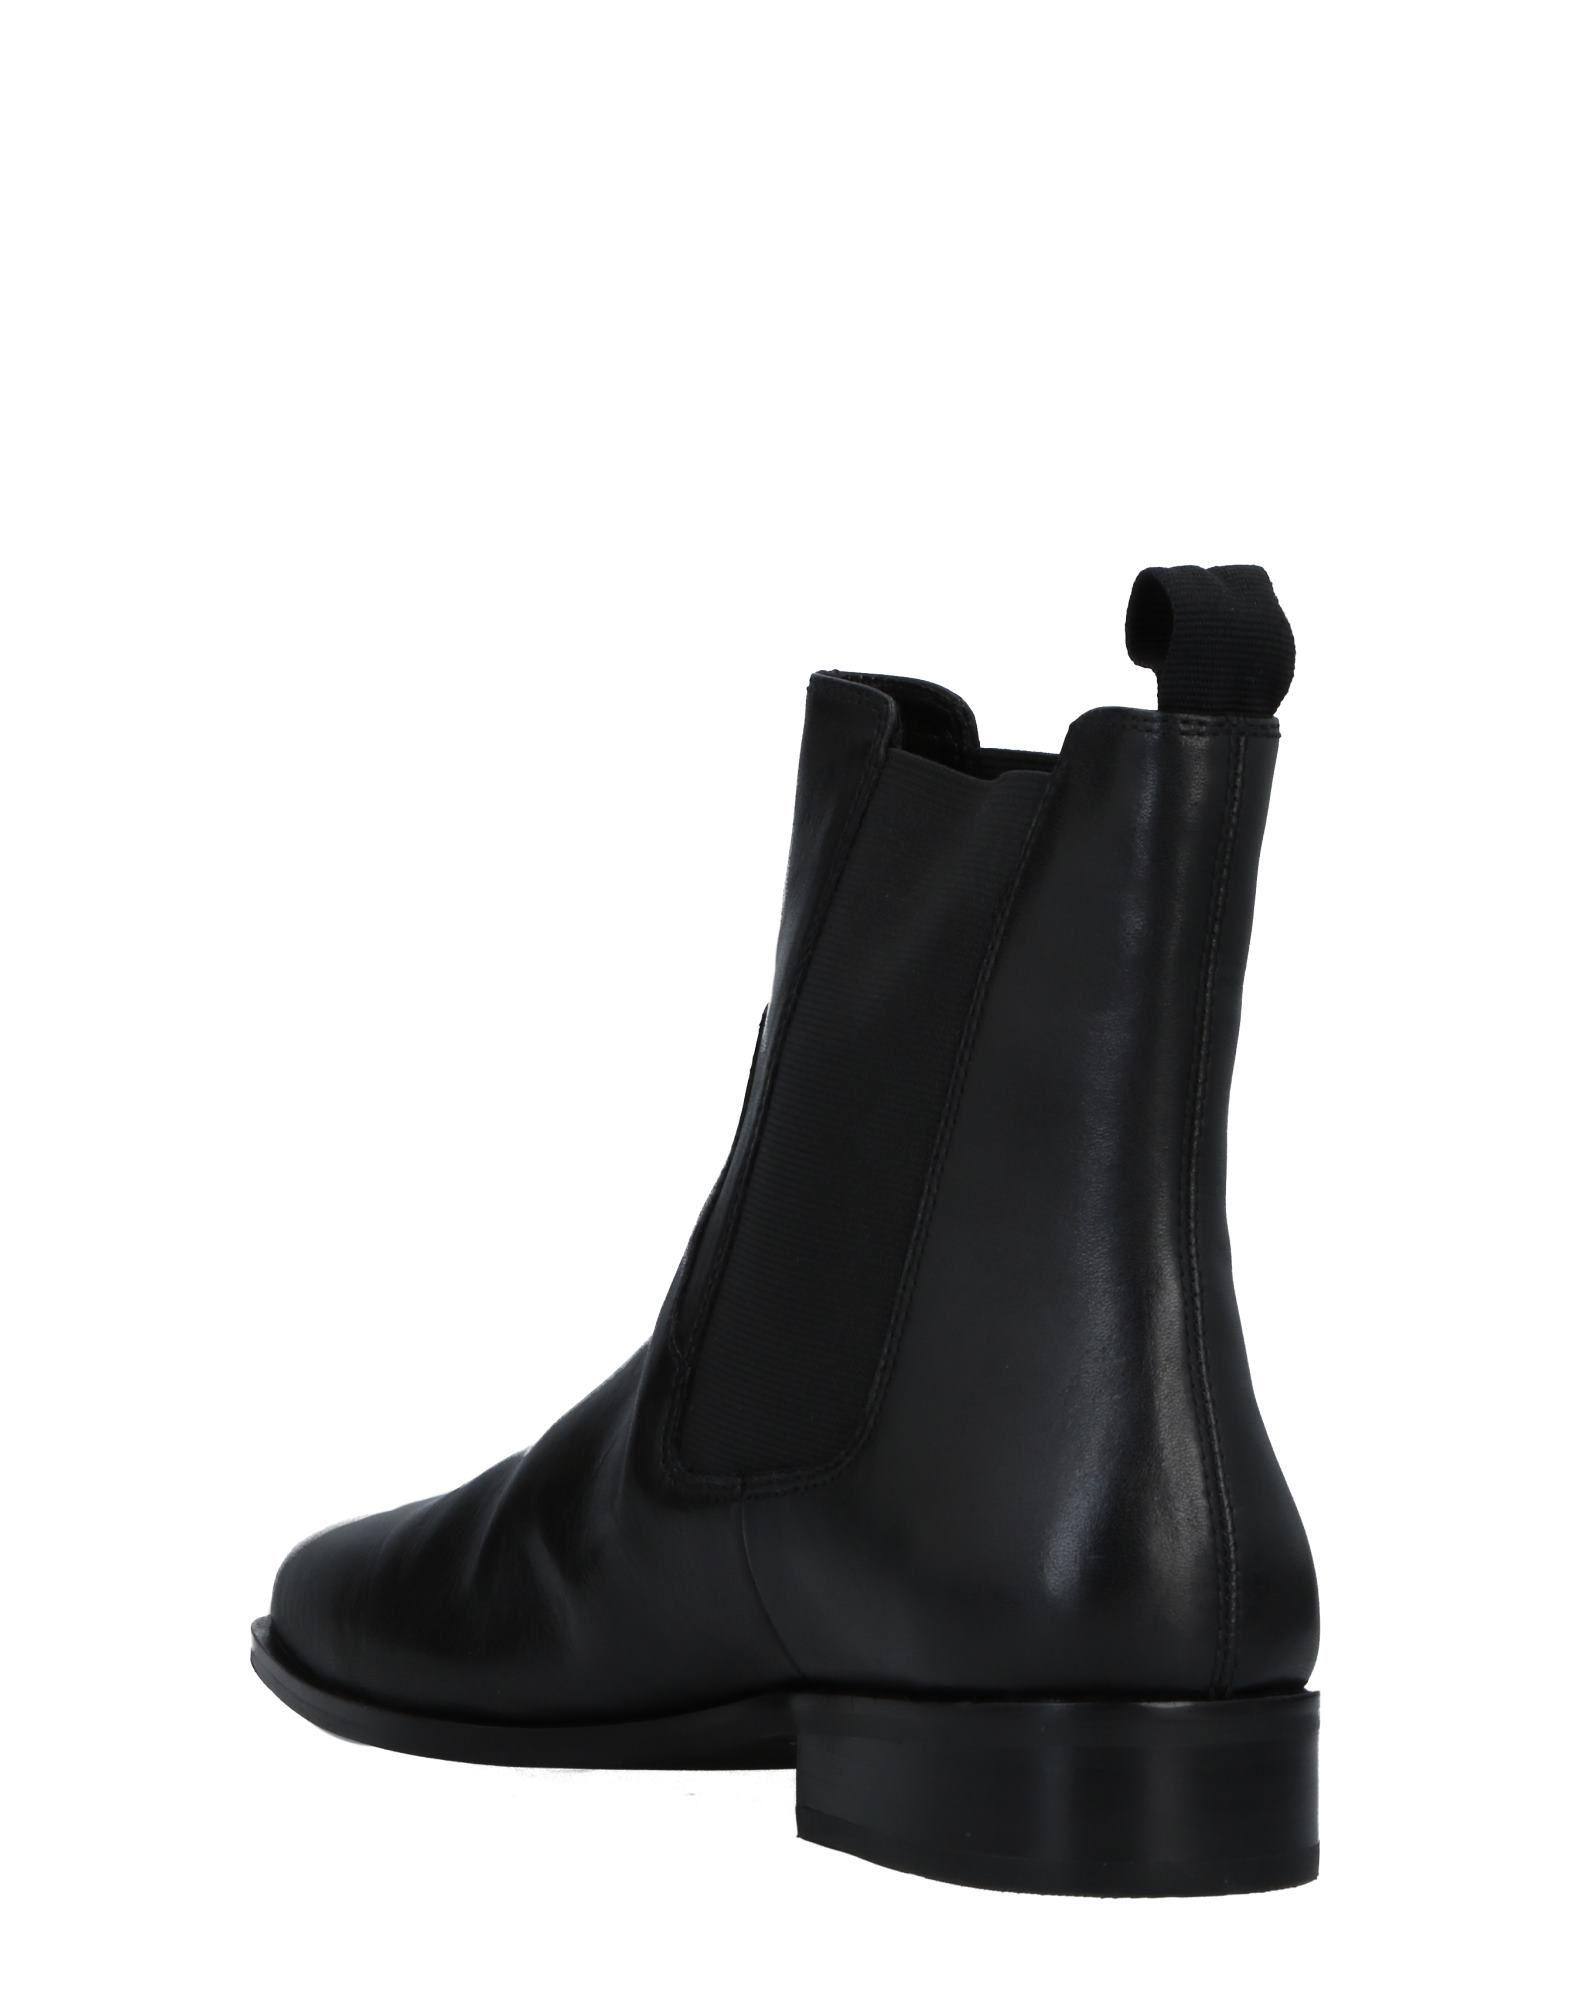 Vagabond Vagabond Vagabond Shoemakers Stiefelette Herren  11516874VJ 96a1c9